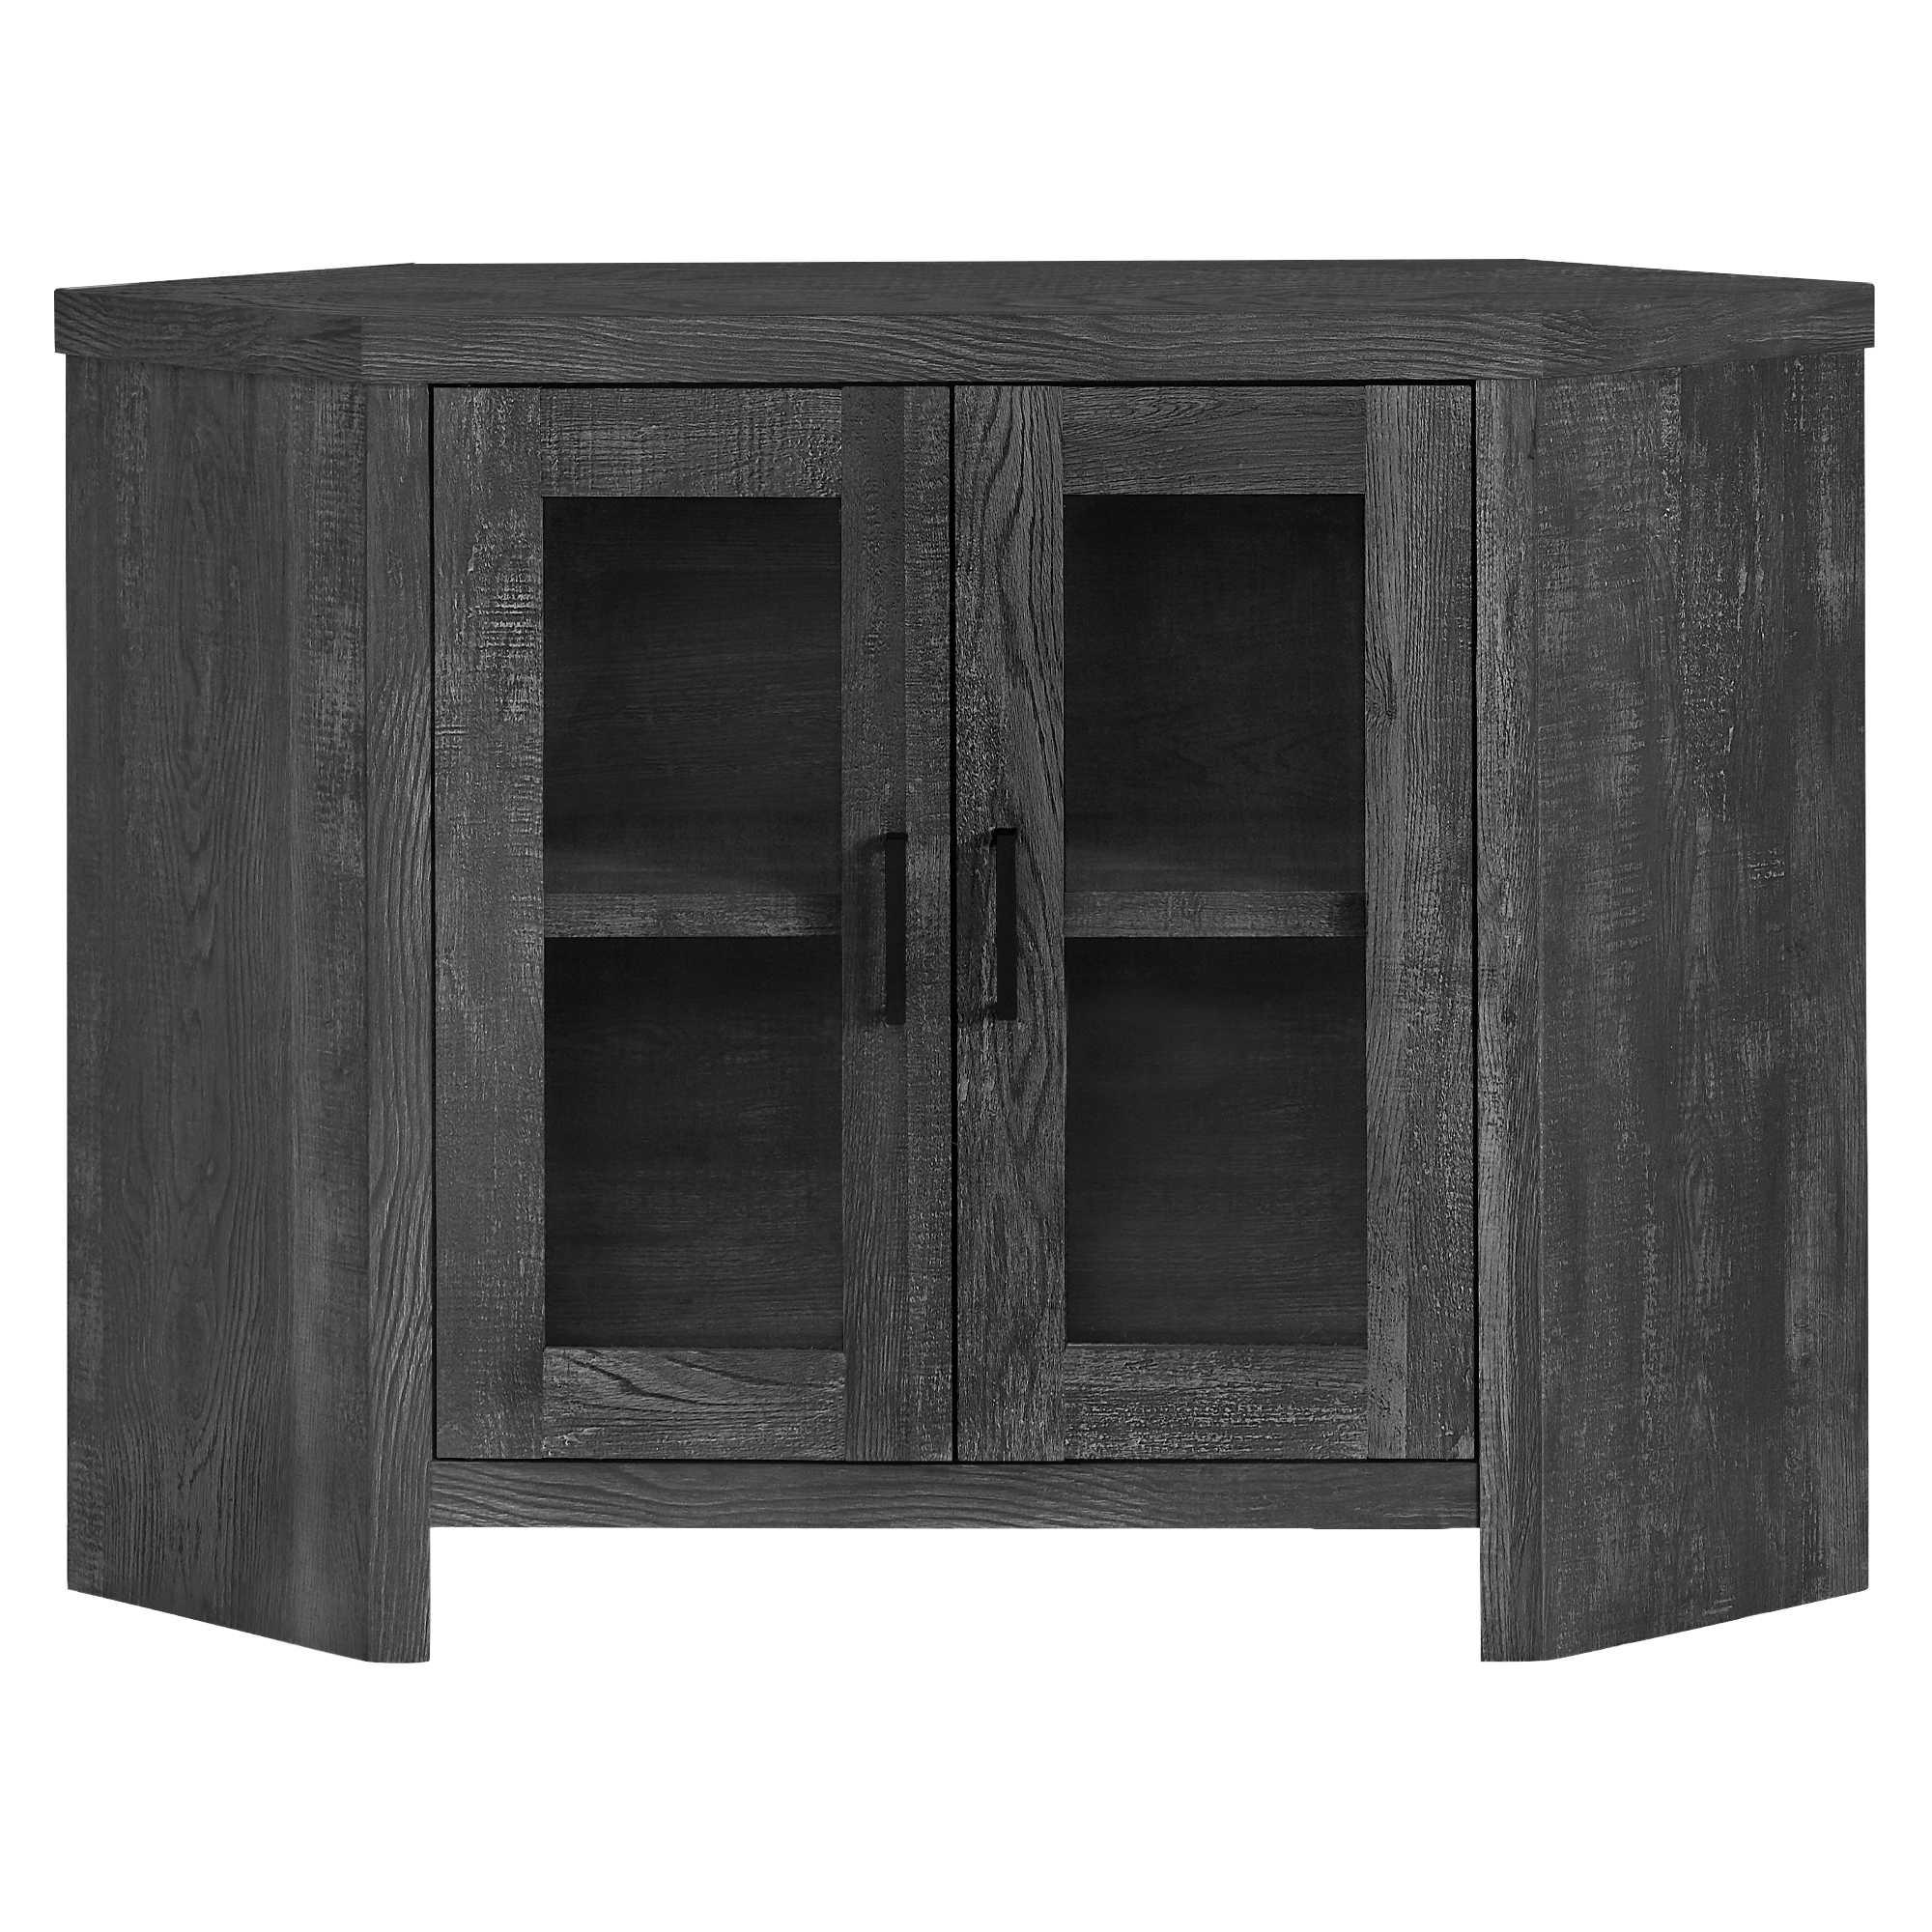 "42"" X 15.5"" X 30"" Black Reclaimed Wood-Look Corner Tv Stand"